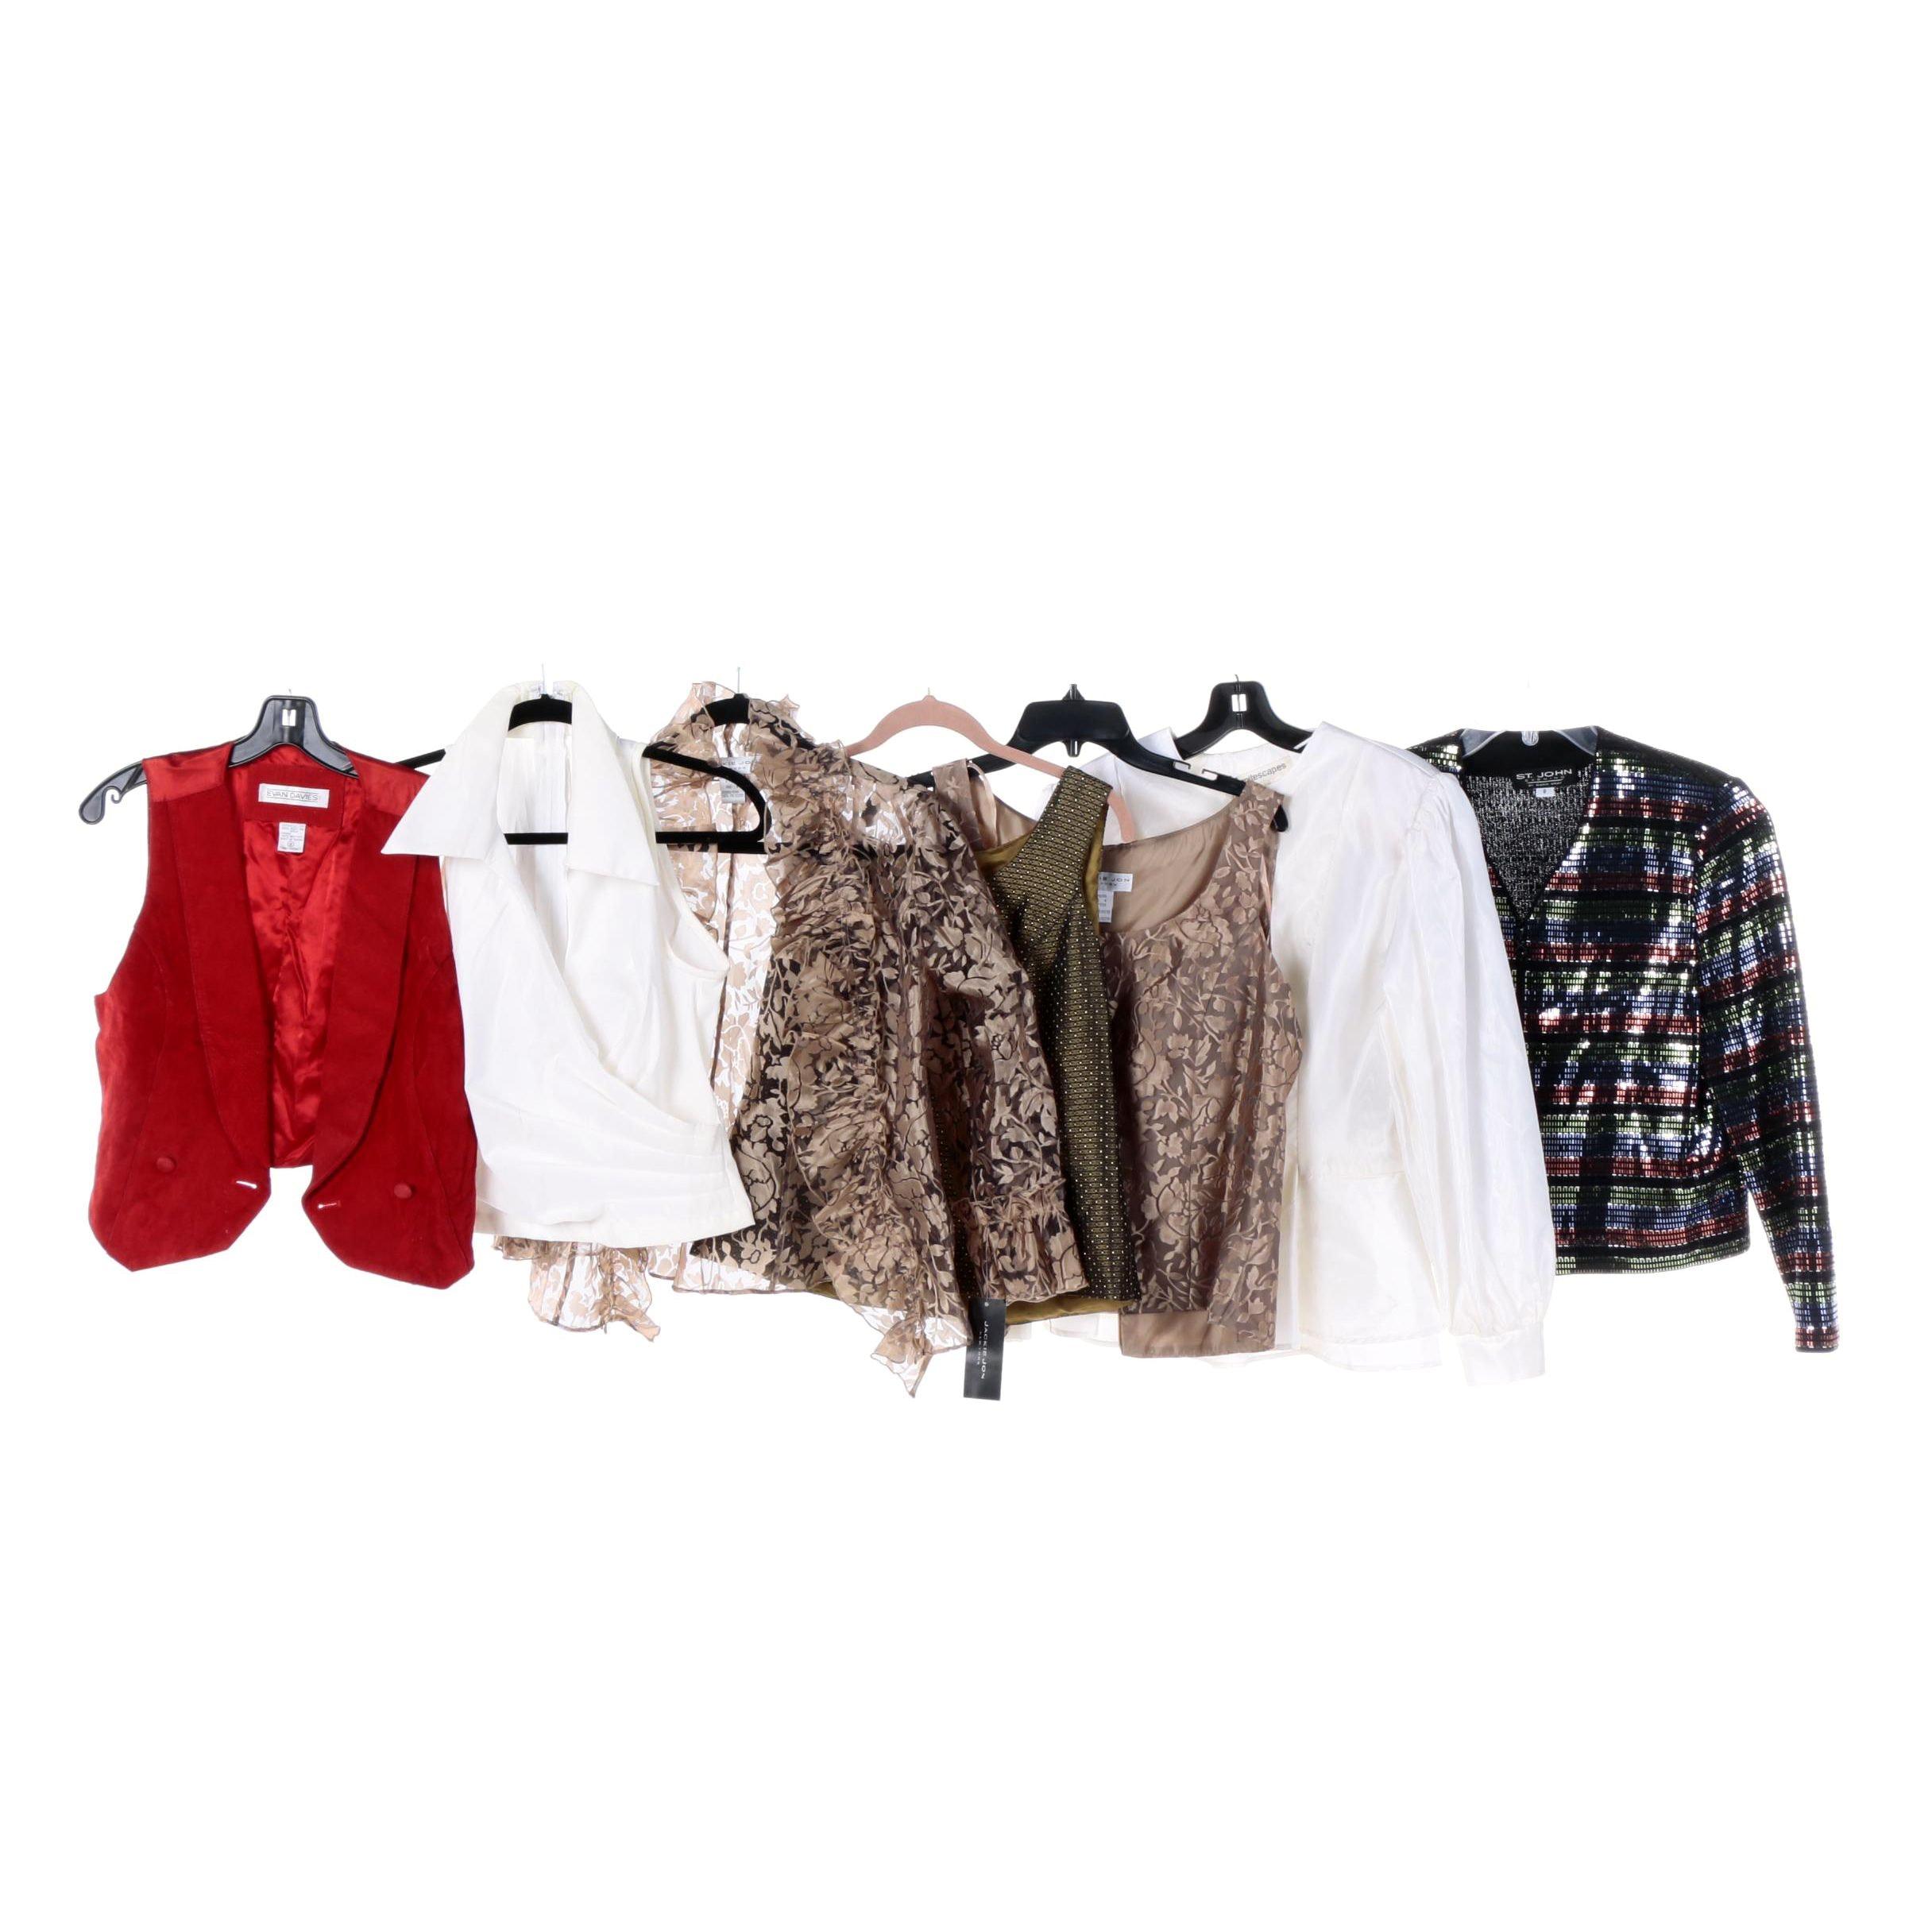 Women's Evening Wear Tops and Jackets Including St. John Evening